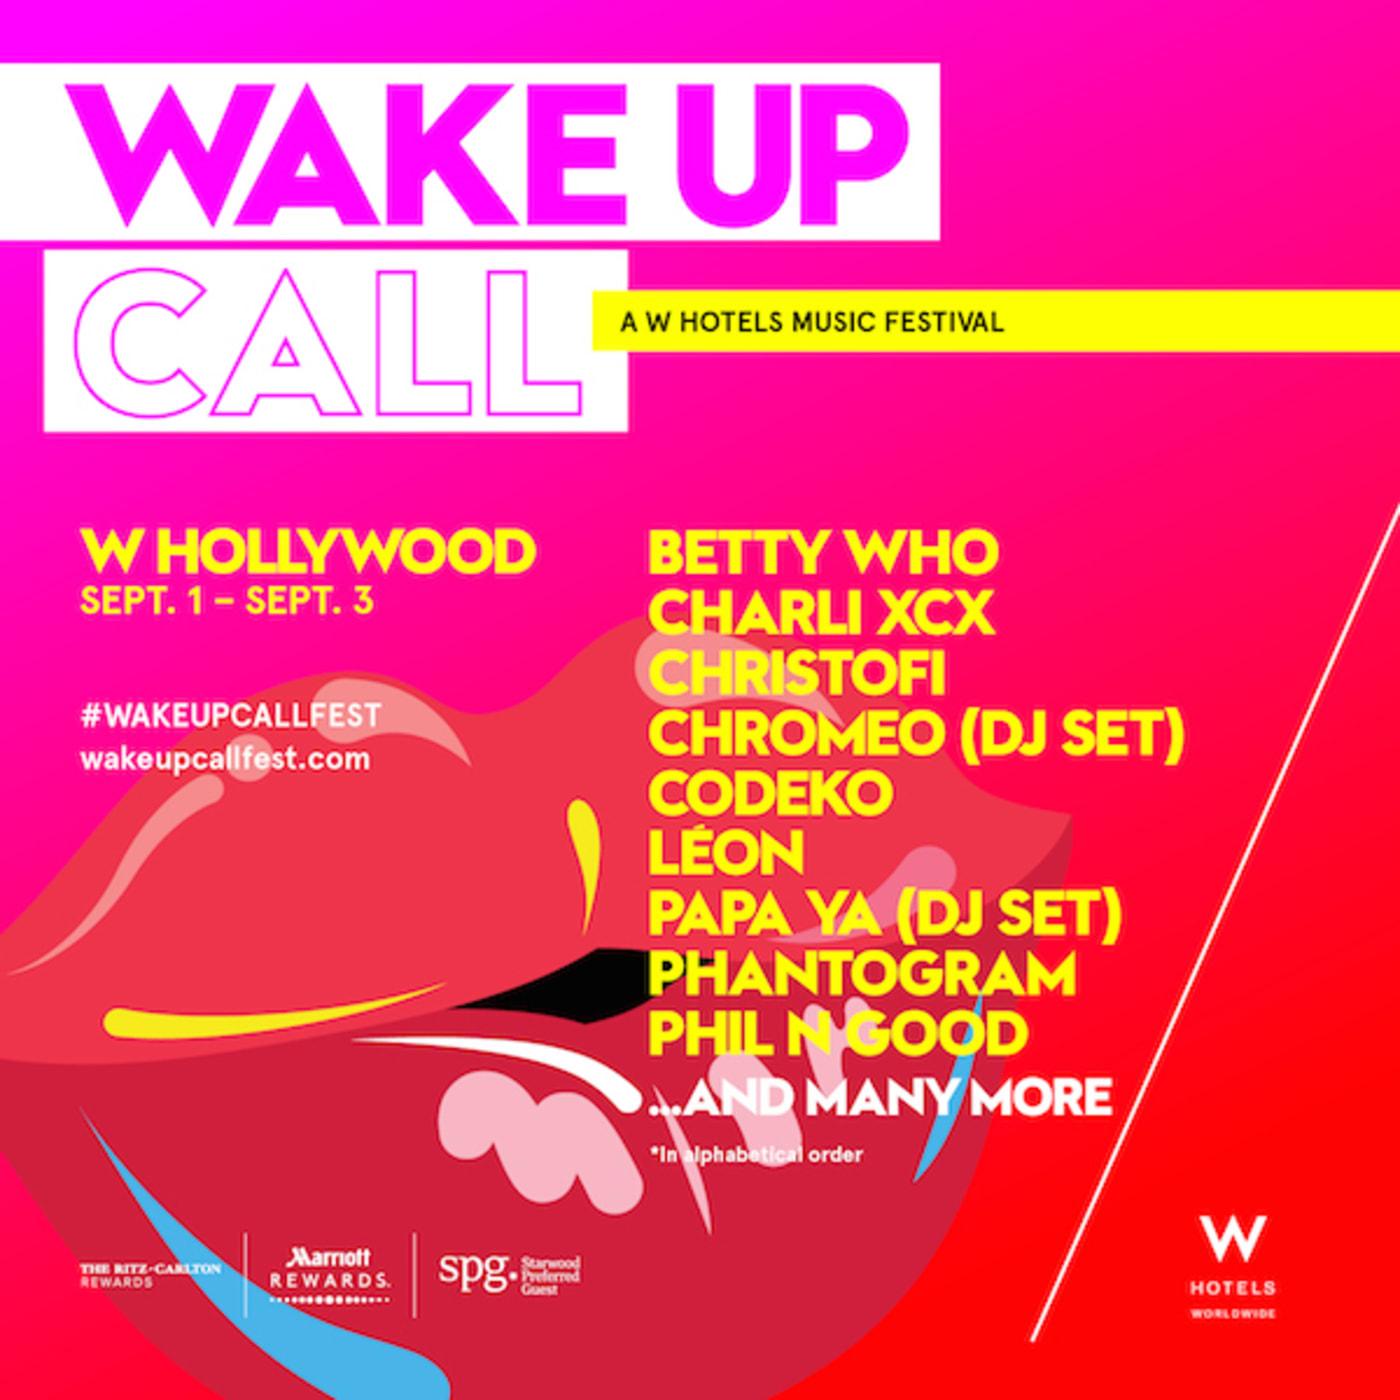 W Hotel 'Wake Up Call'